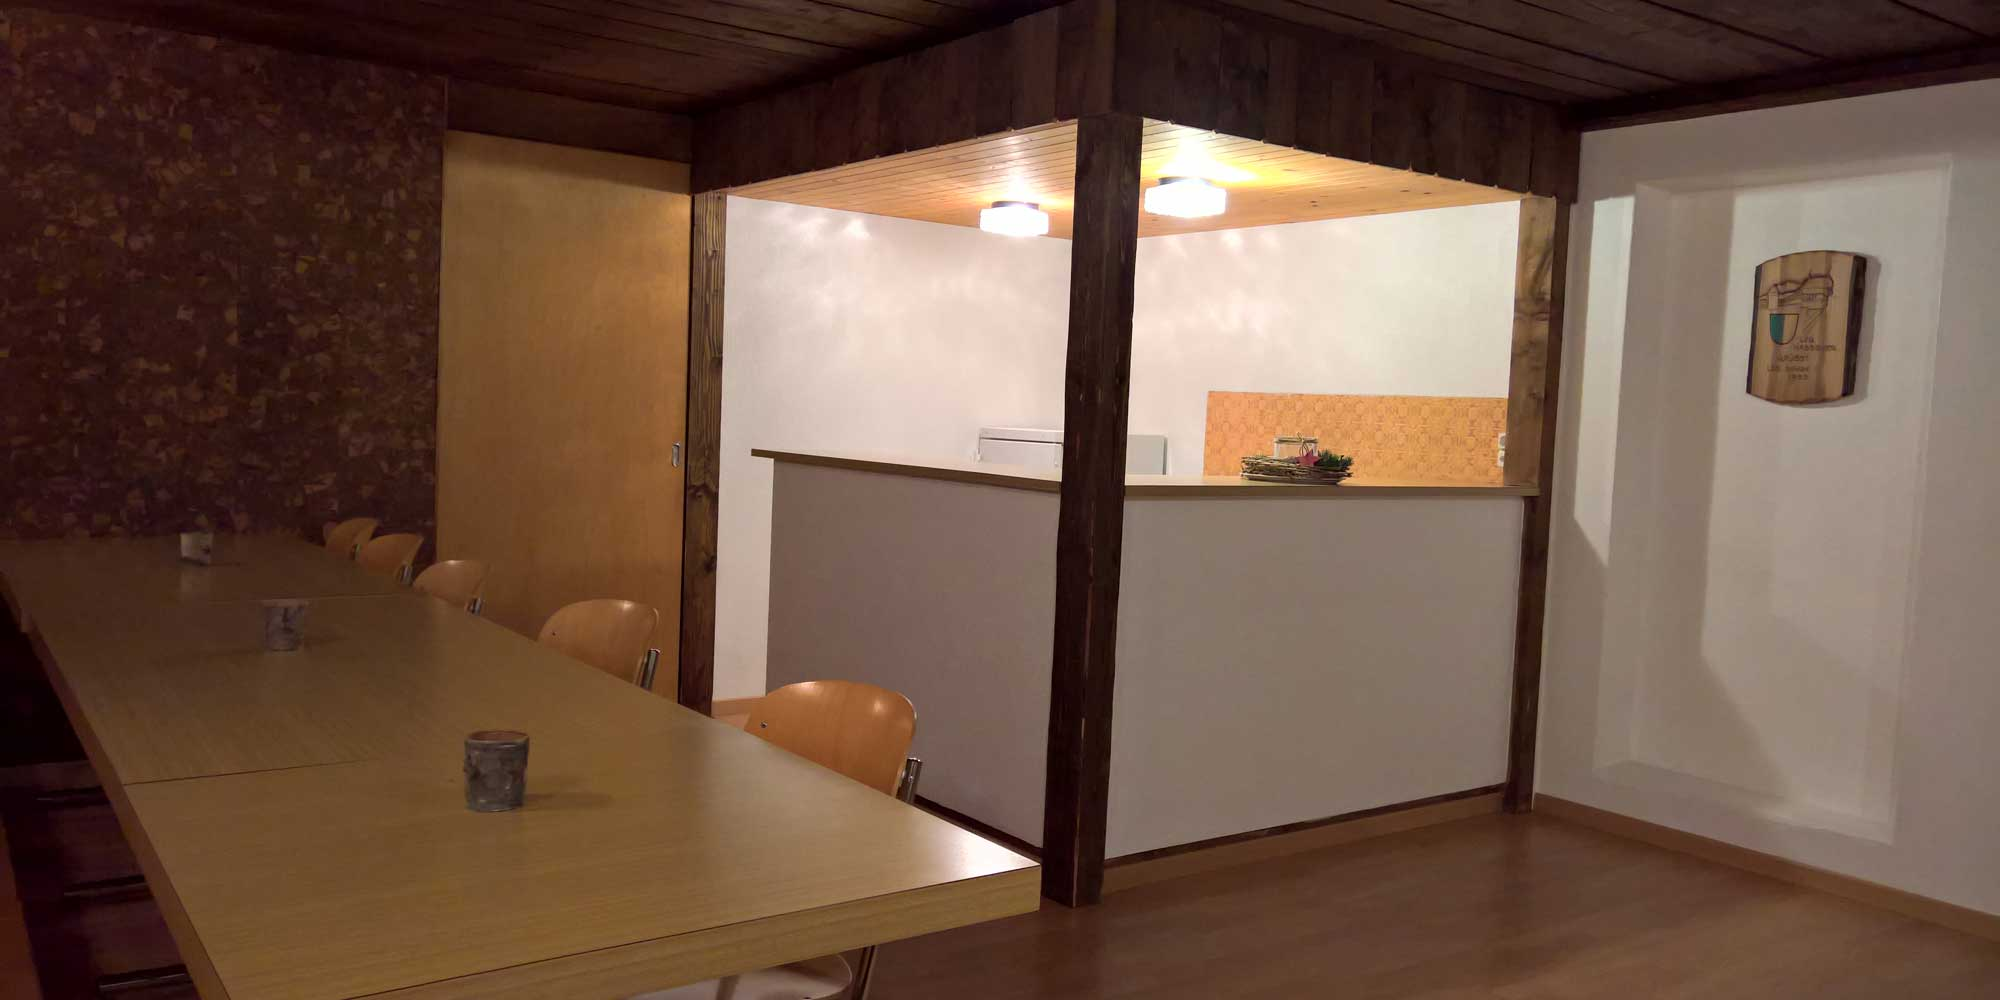 bar au sous sol bildungszentrum burgb hl. Black Bedroom Furniture Sets. Home Design Ideas